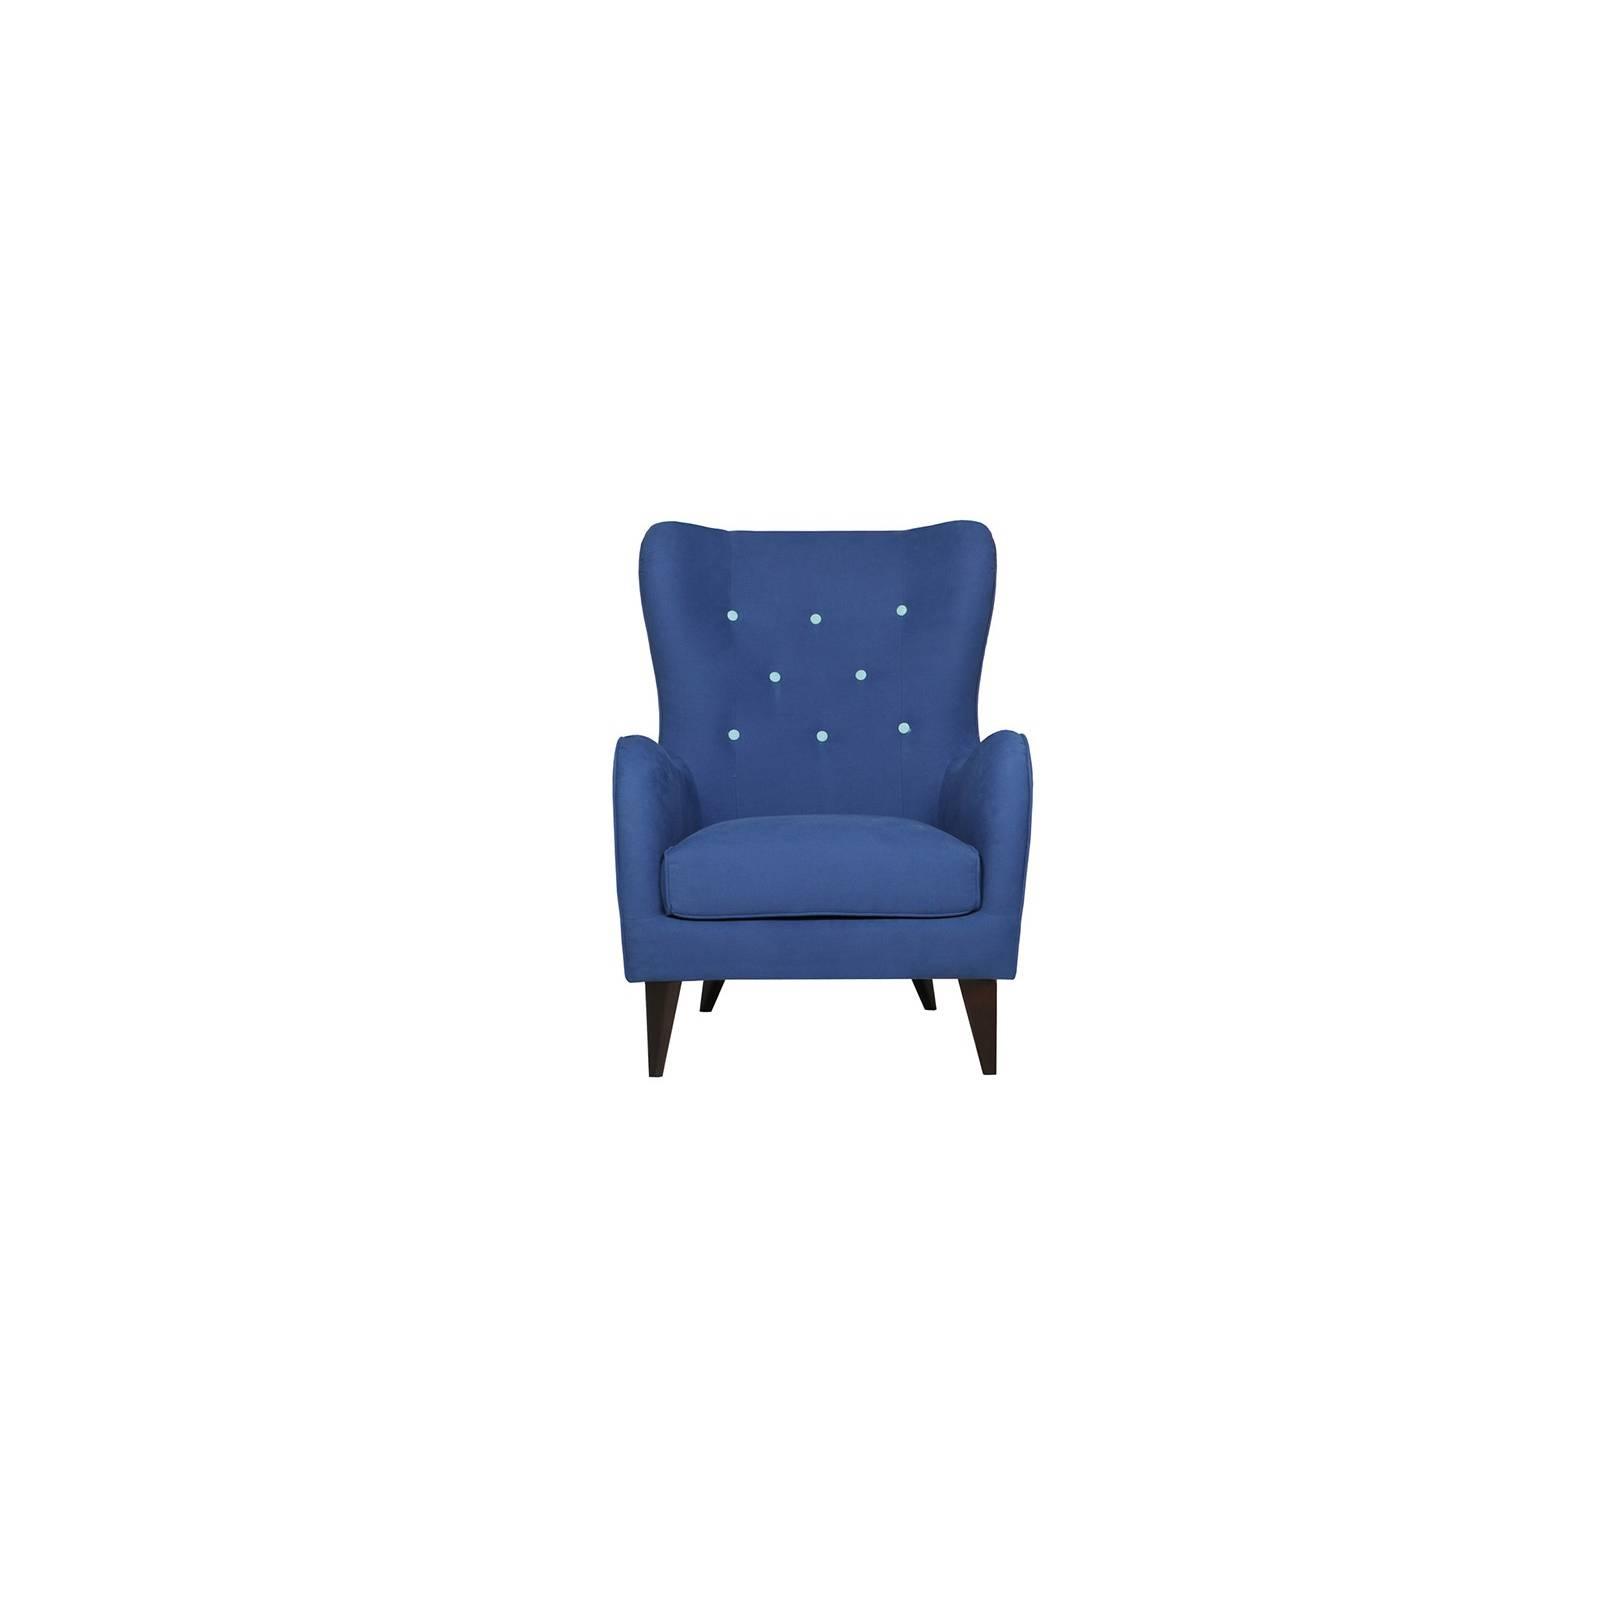 Fauteuil Pola Tissu - fauteuil personnalisable